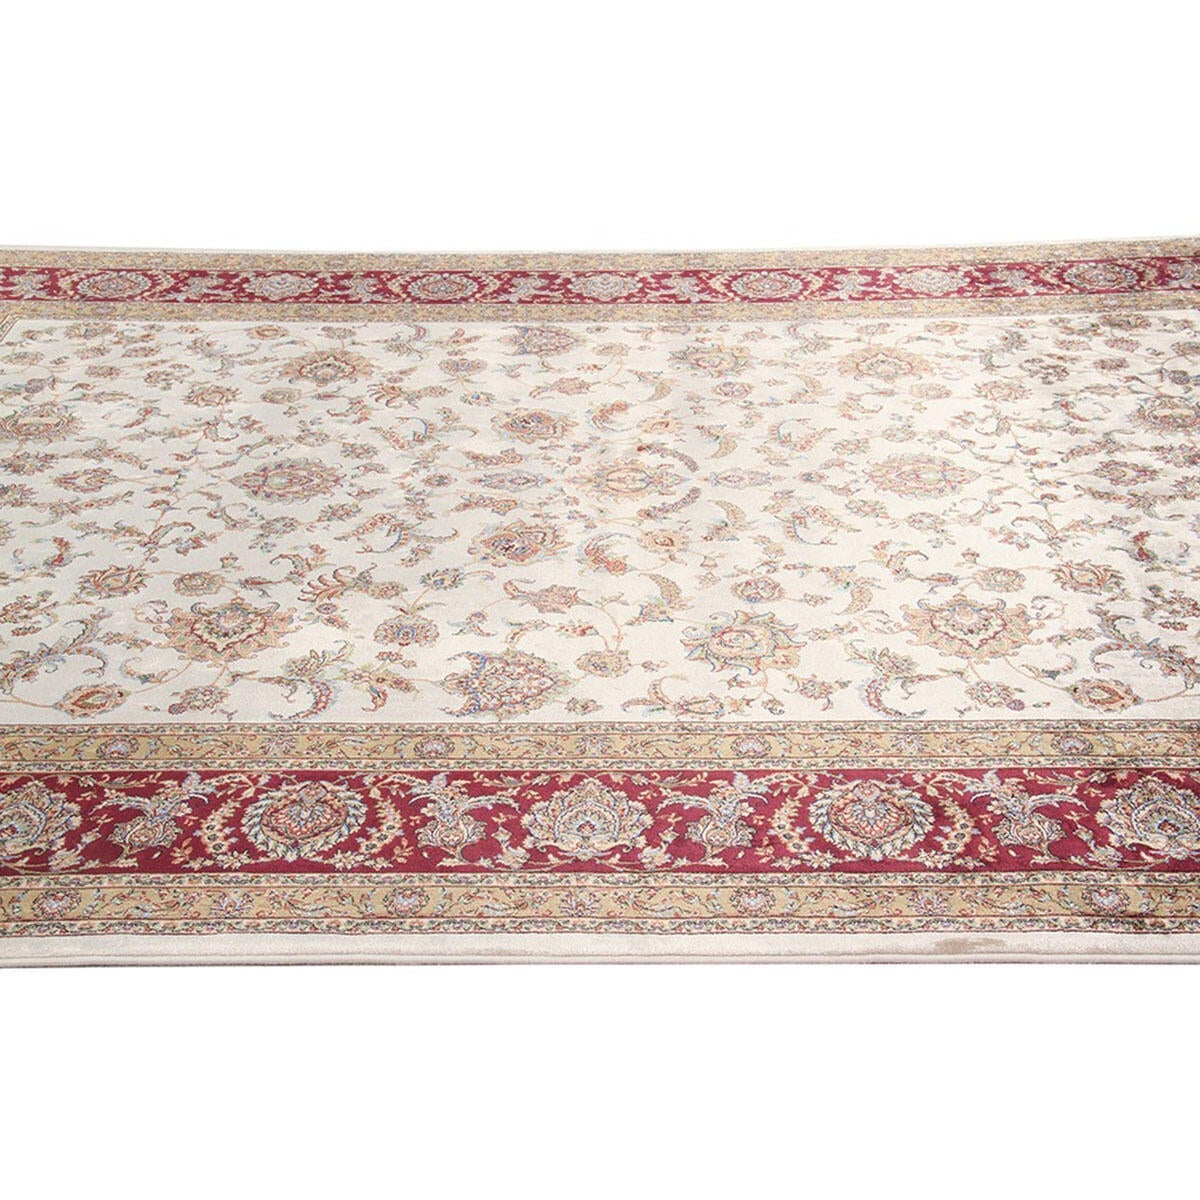 Tappeto Qoum Shah 2 in cotone, beige, 200x300 - 4